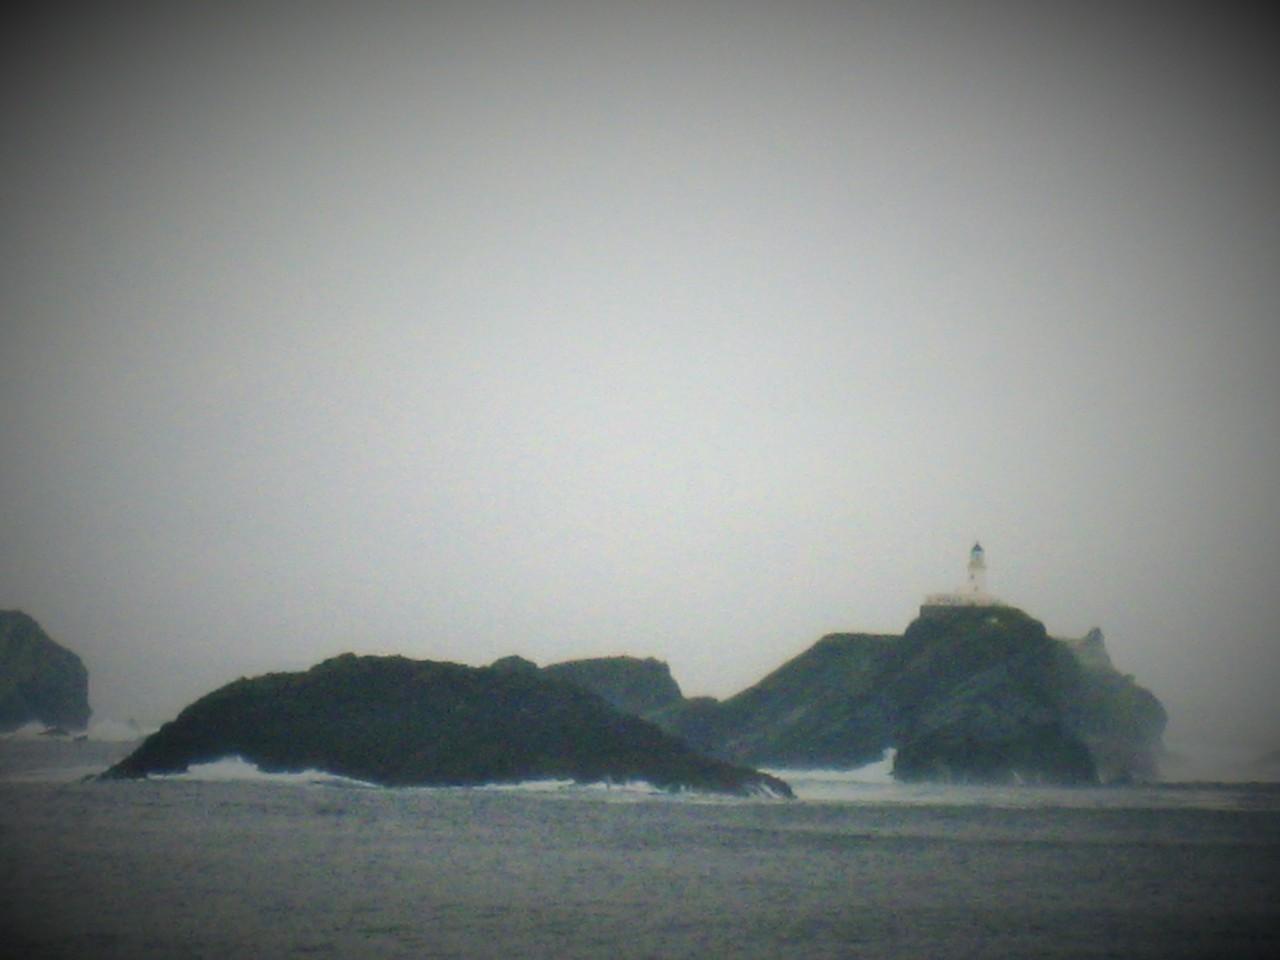 Shetlandic mists